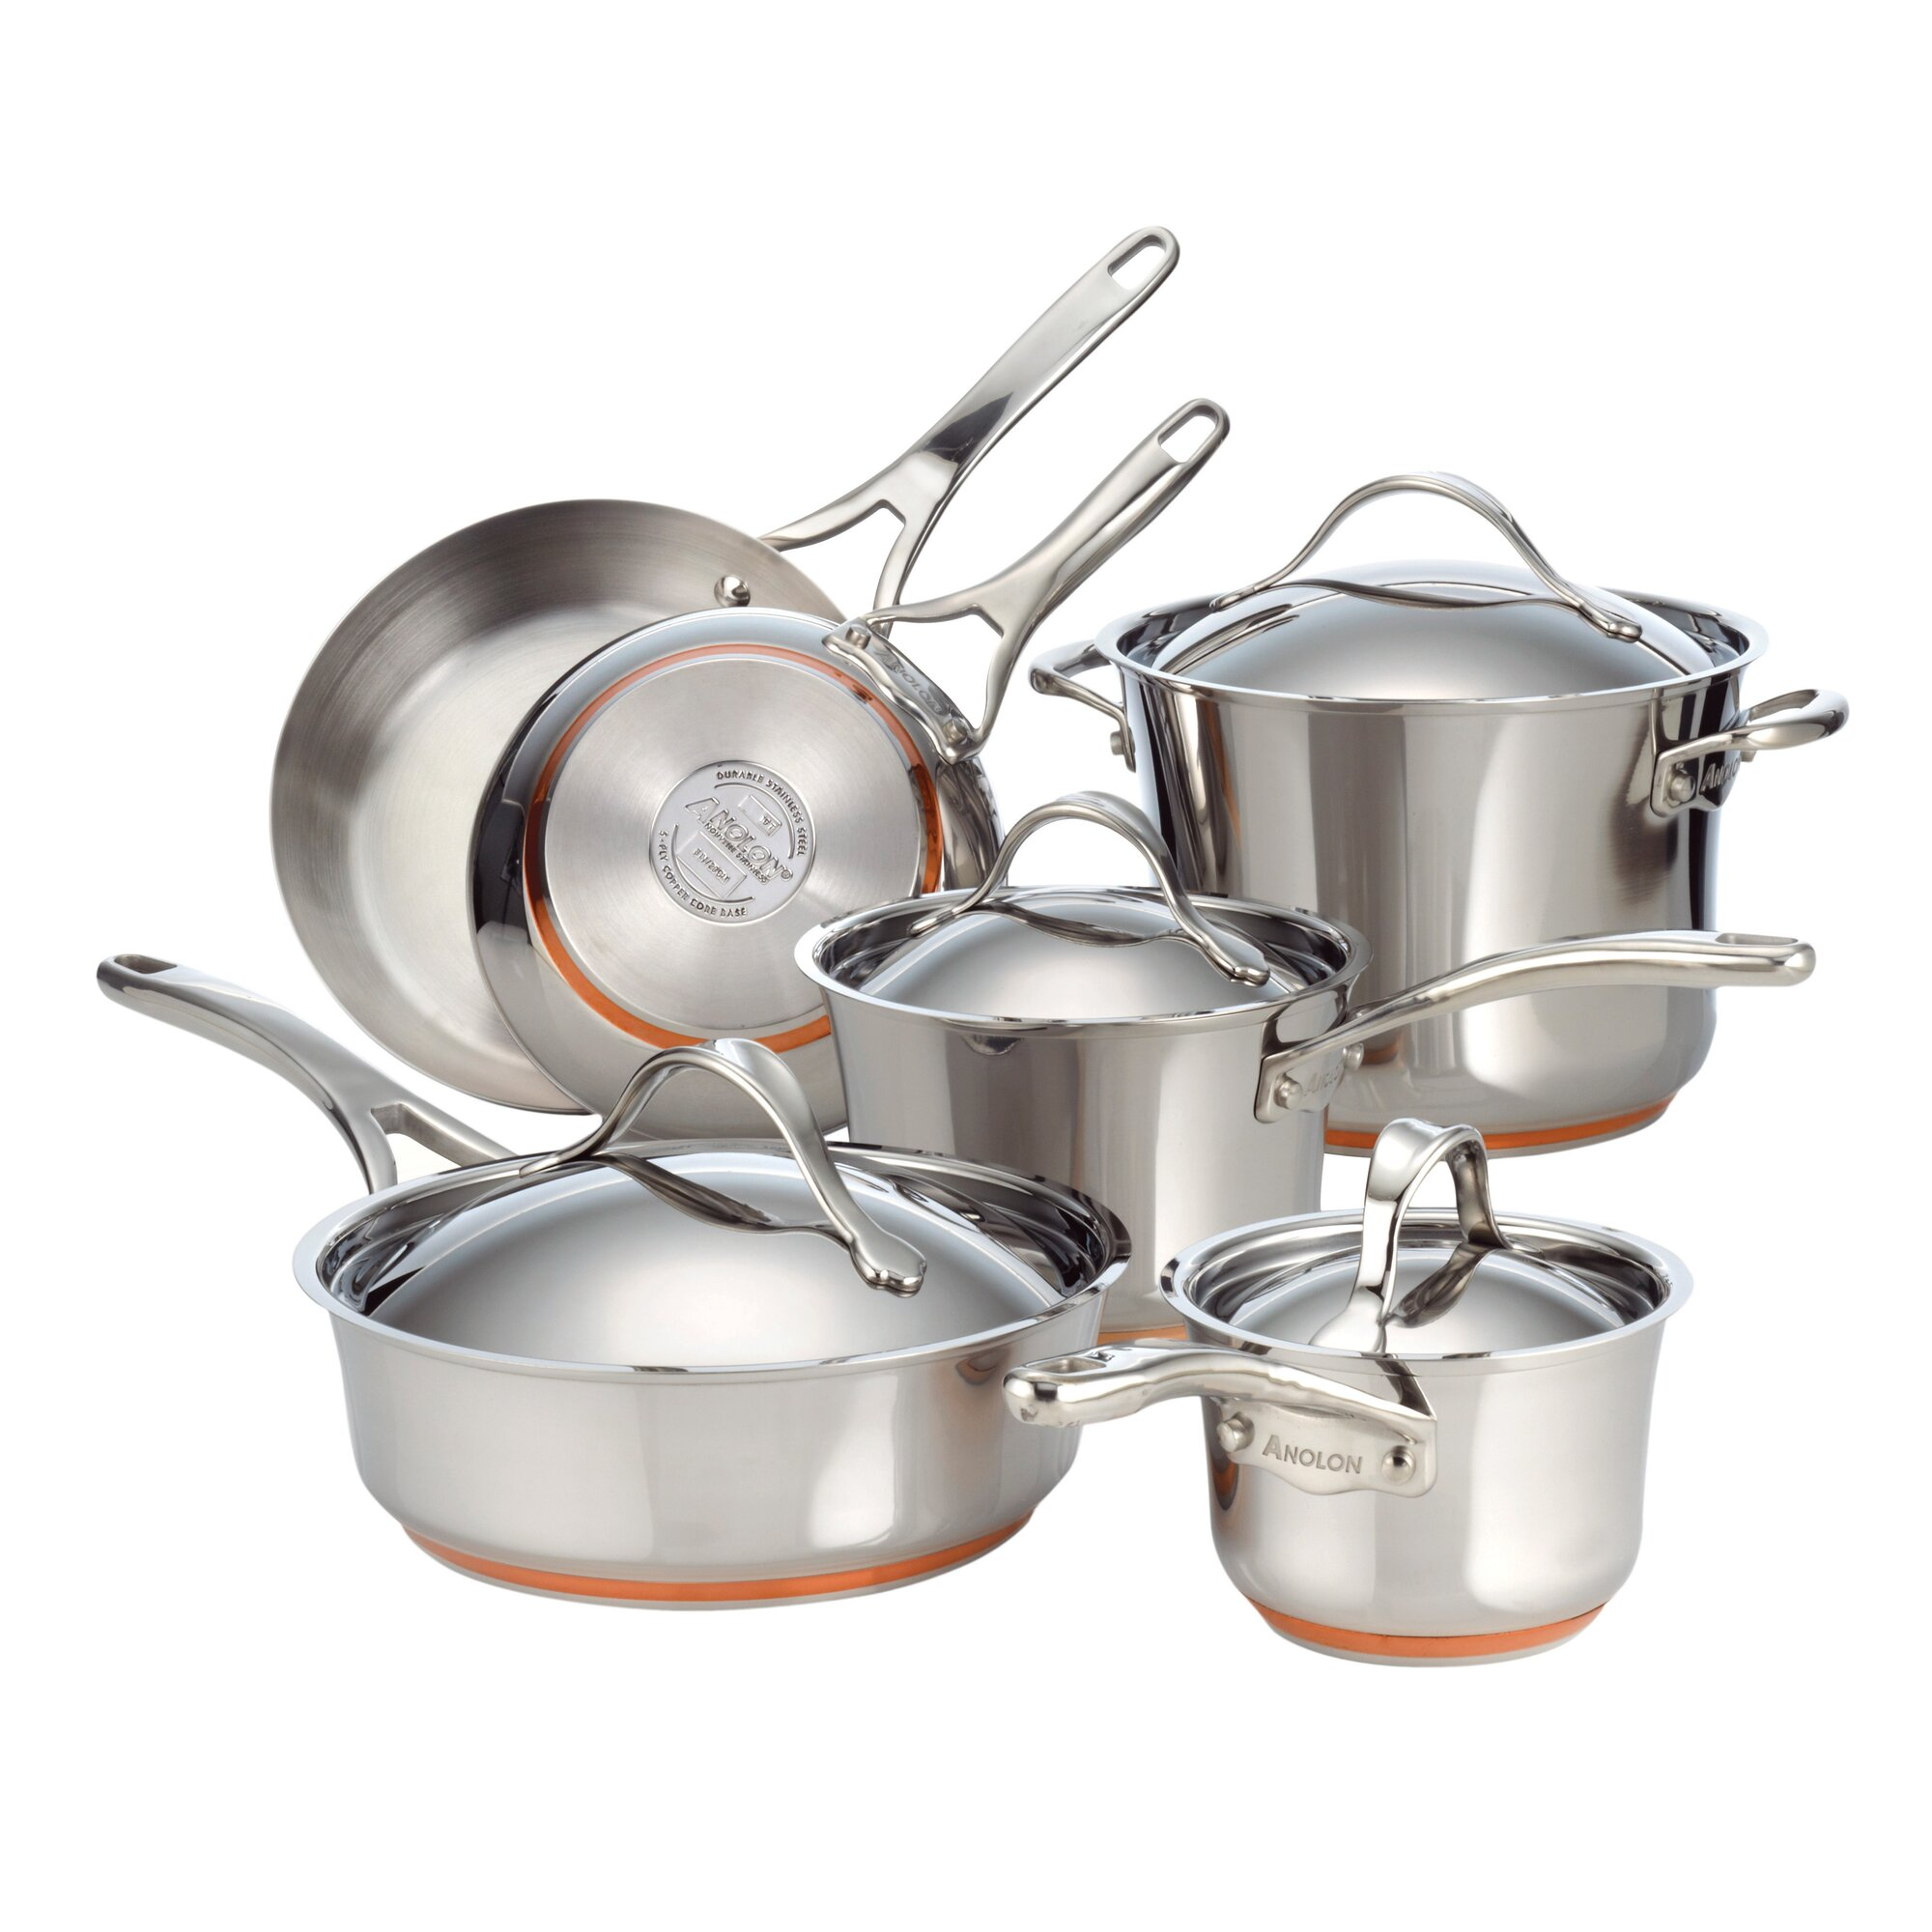 Anolon Nouvelle Copper Stainless Steel 10 Piece Cookware Set ...